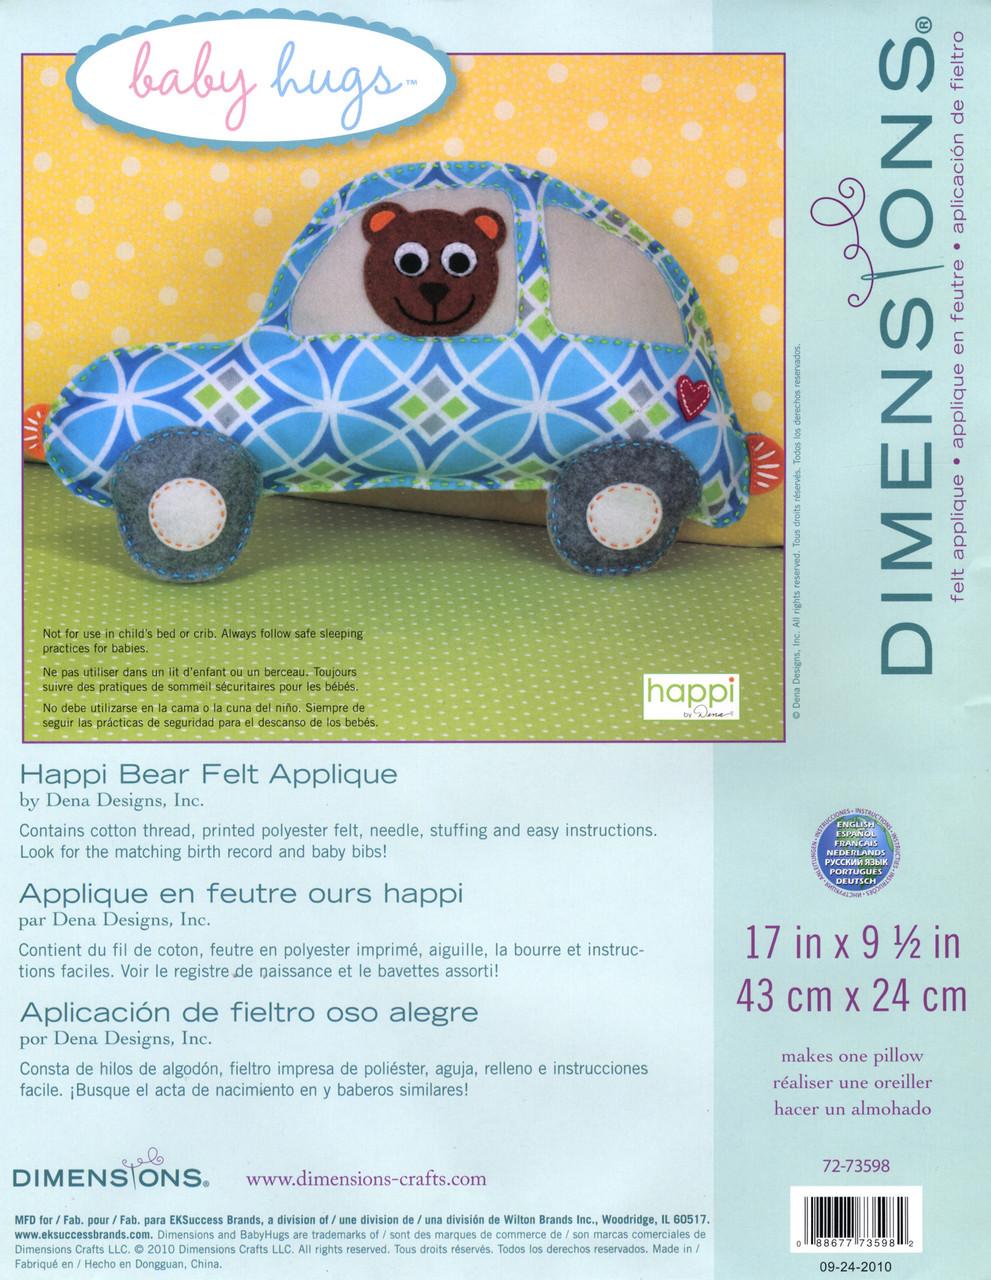 Dimensions Baby Hugs - Happi Bear Pillow